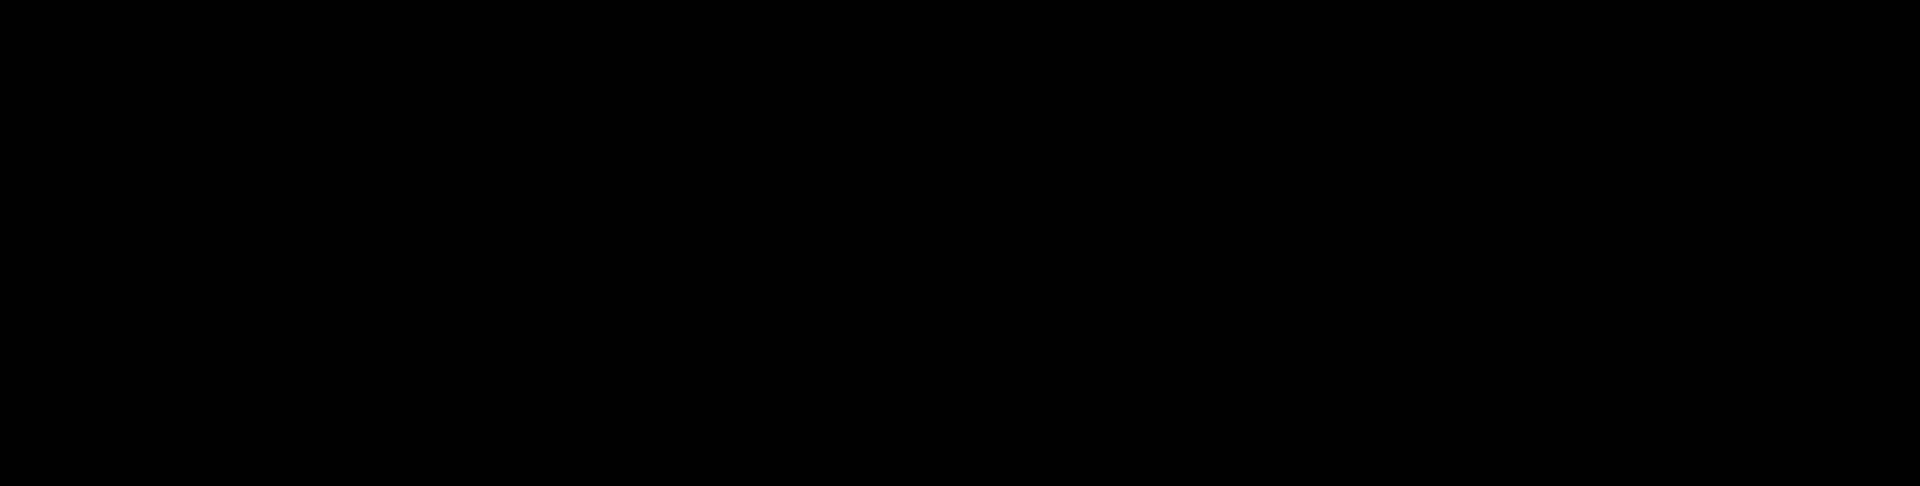 Arkadium Investment Group logo